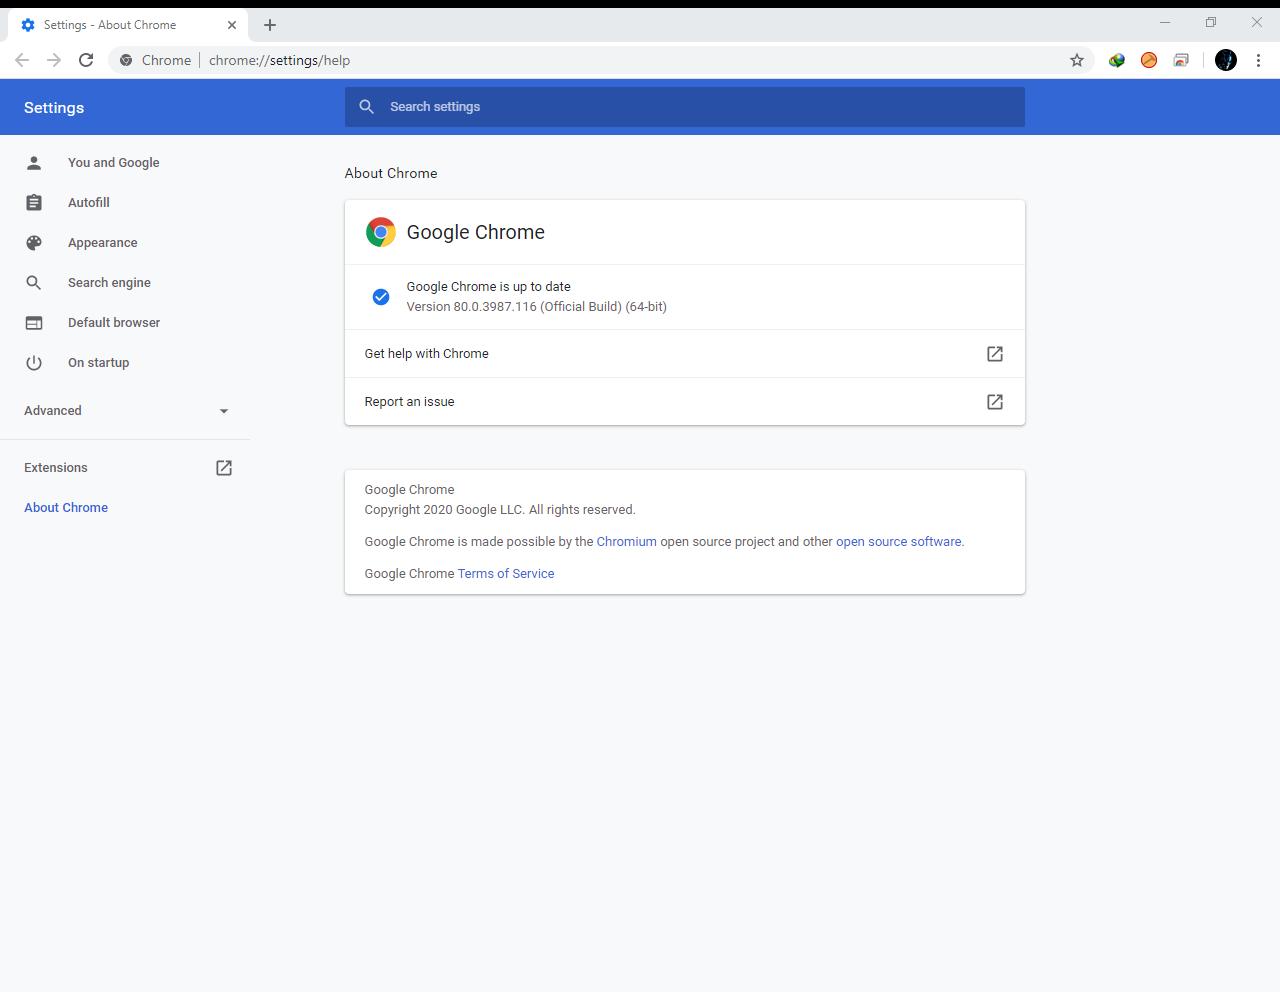 Google Chrome Browser 80.0.3987.116